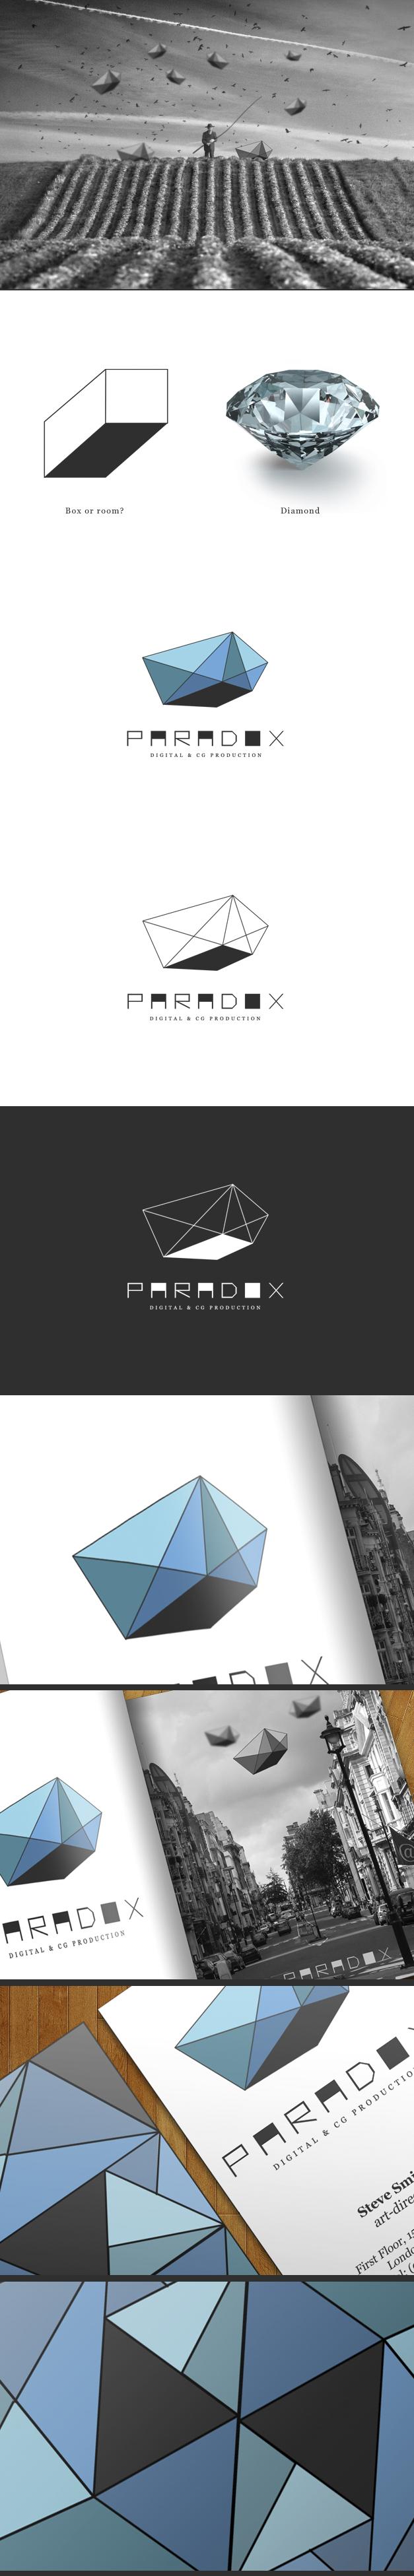 Paradox. Digital&CG production.